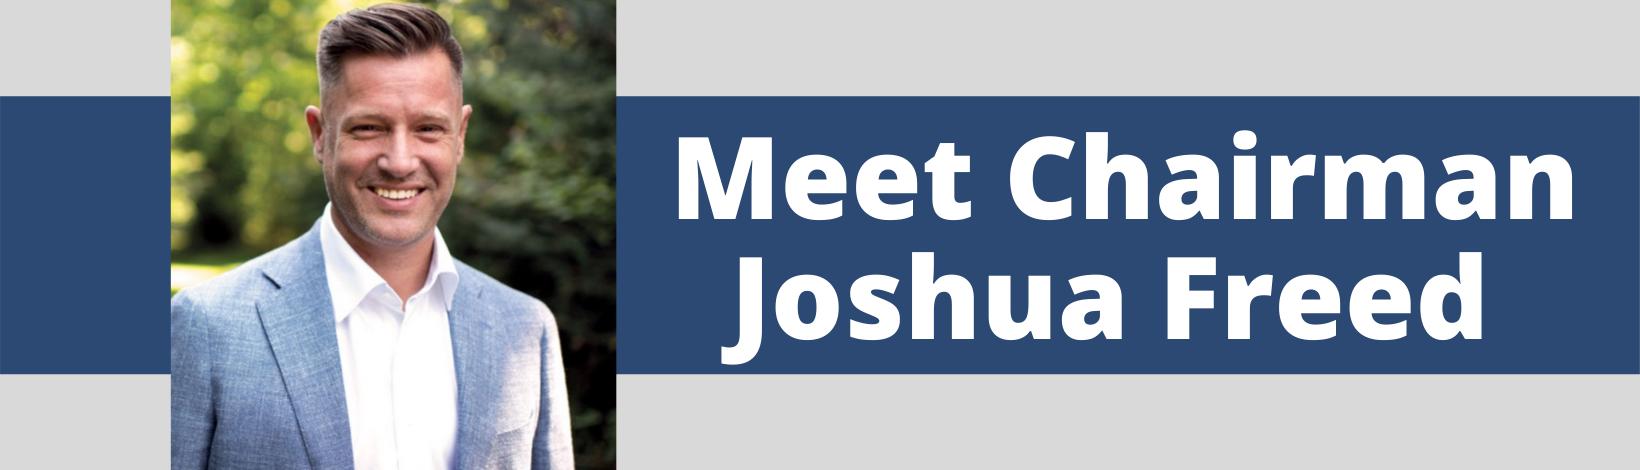 Meet Chairman Joshua Freed